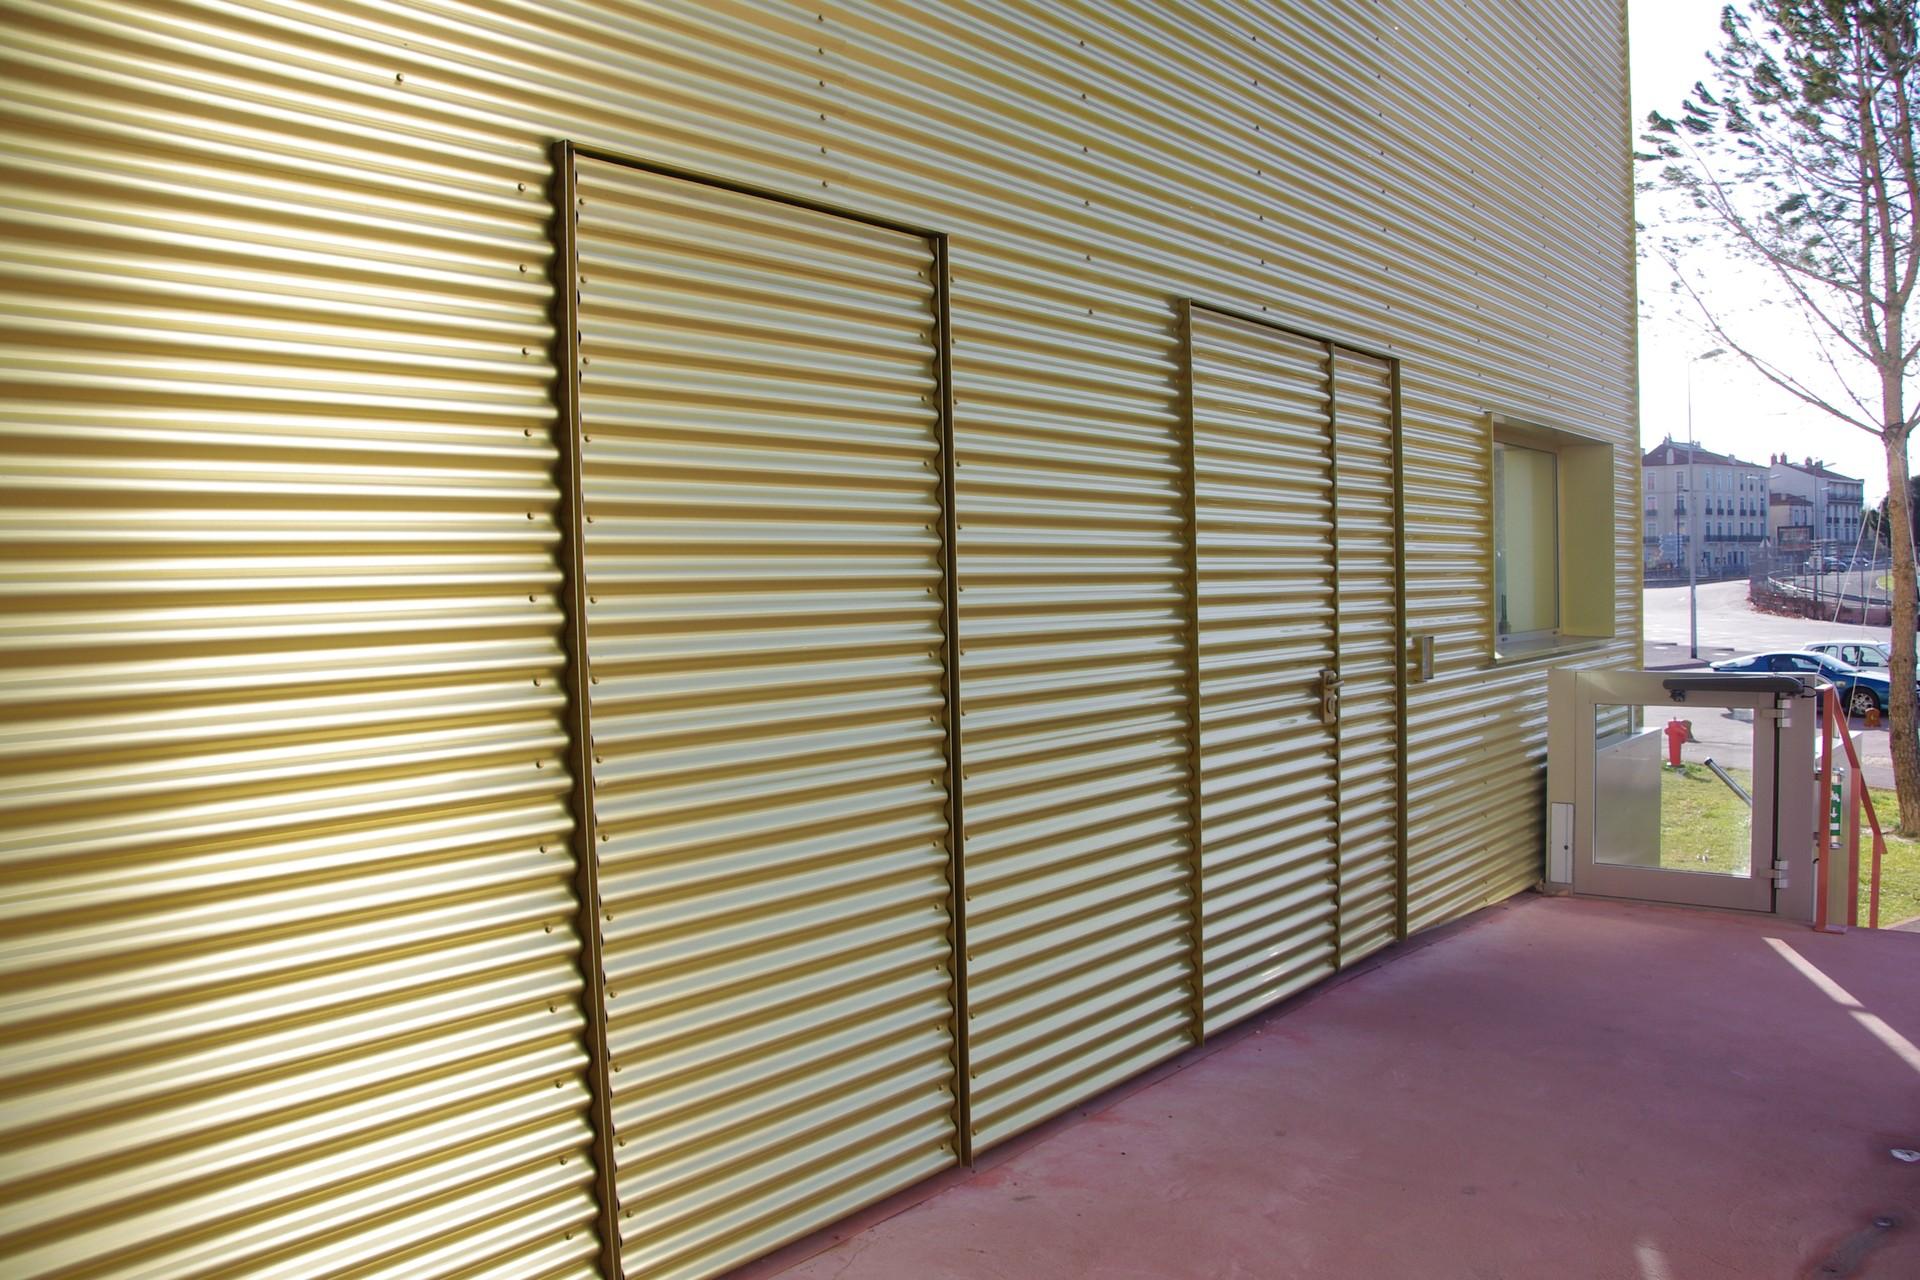 DOORTAL - Théâtre de l'Archipel porte sous tenture